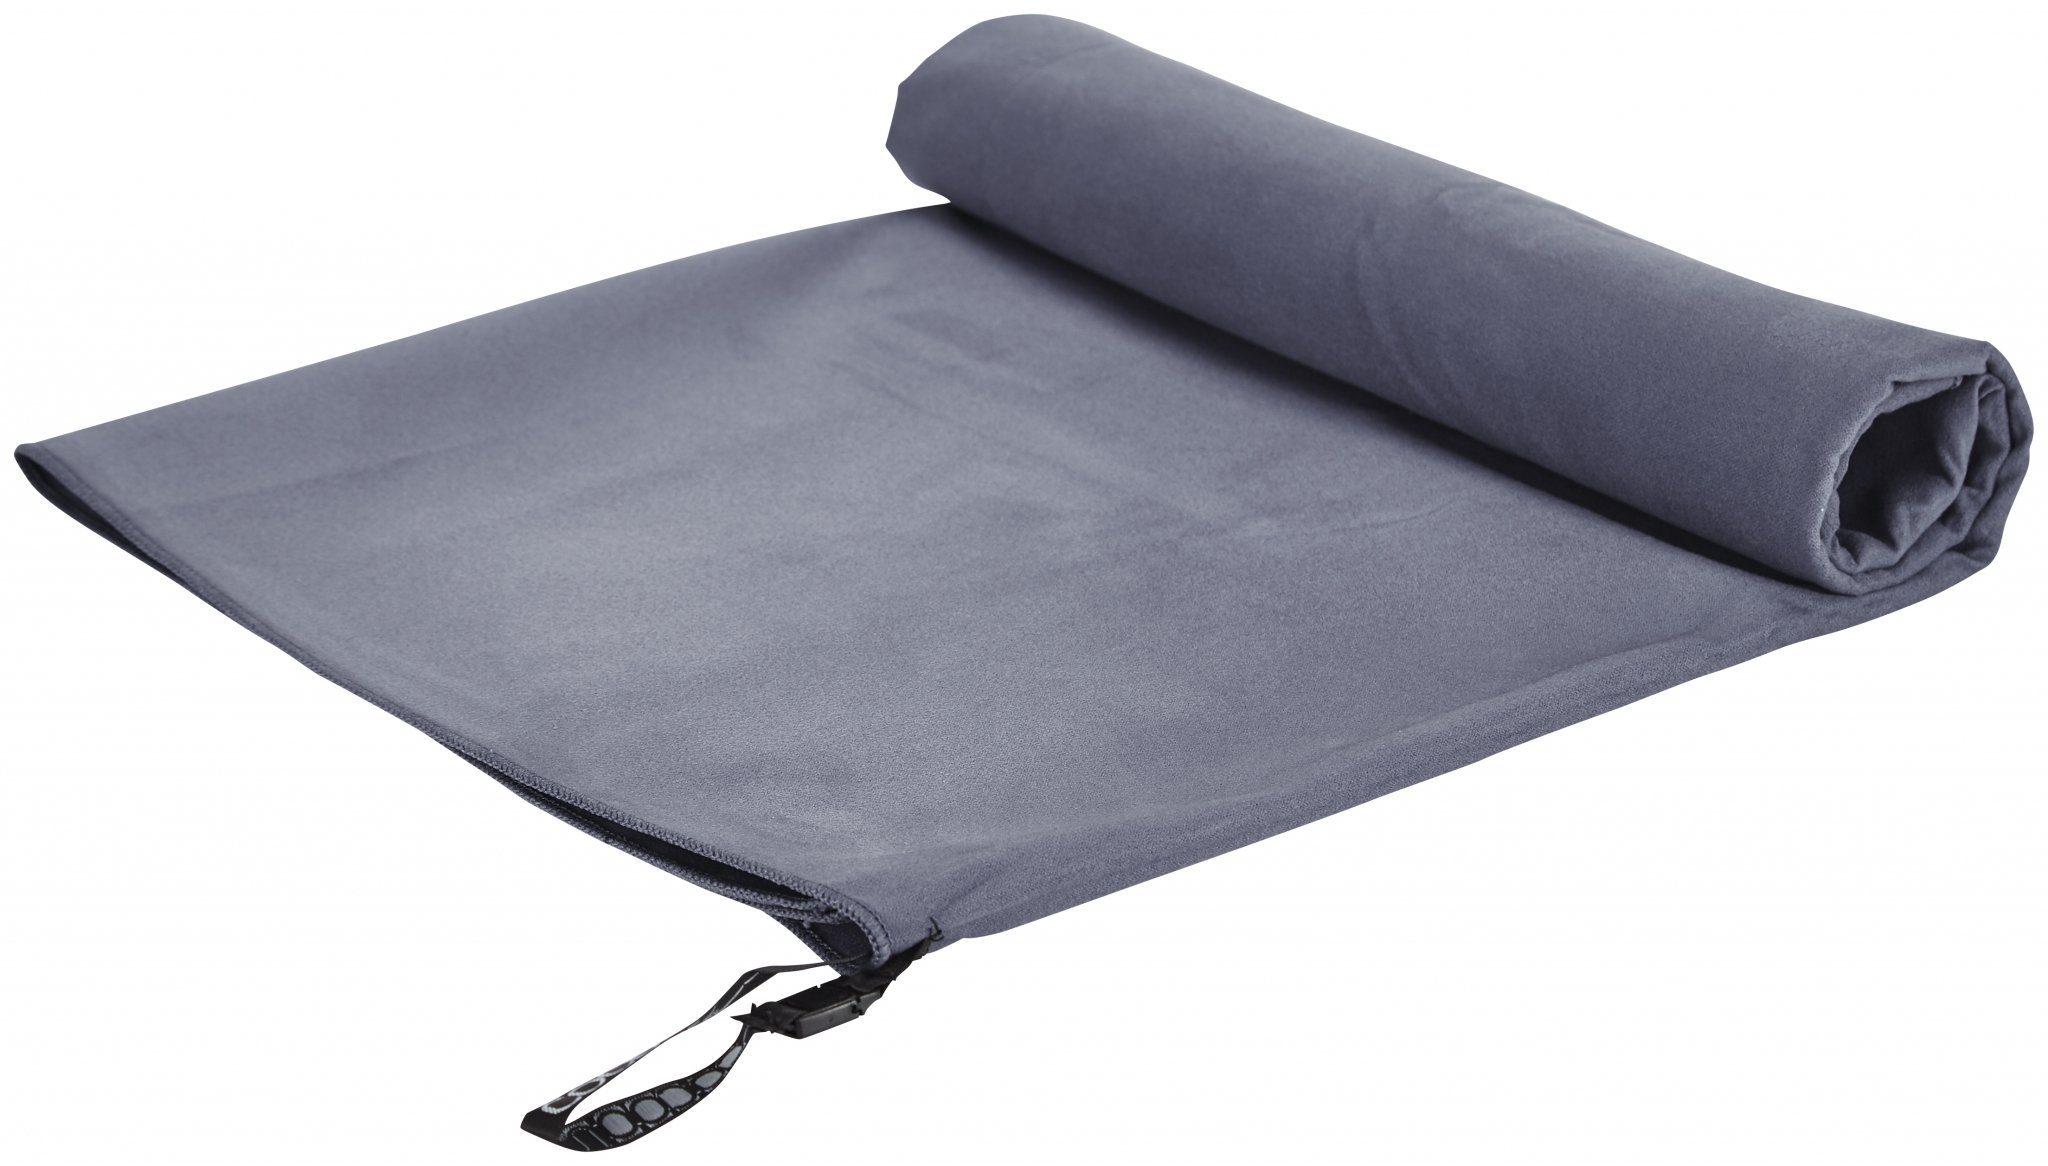 Cocoon Reisehandtuch »Microfiber Towel Ultralight Large«